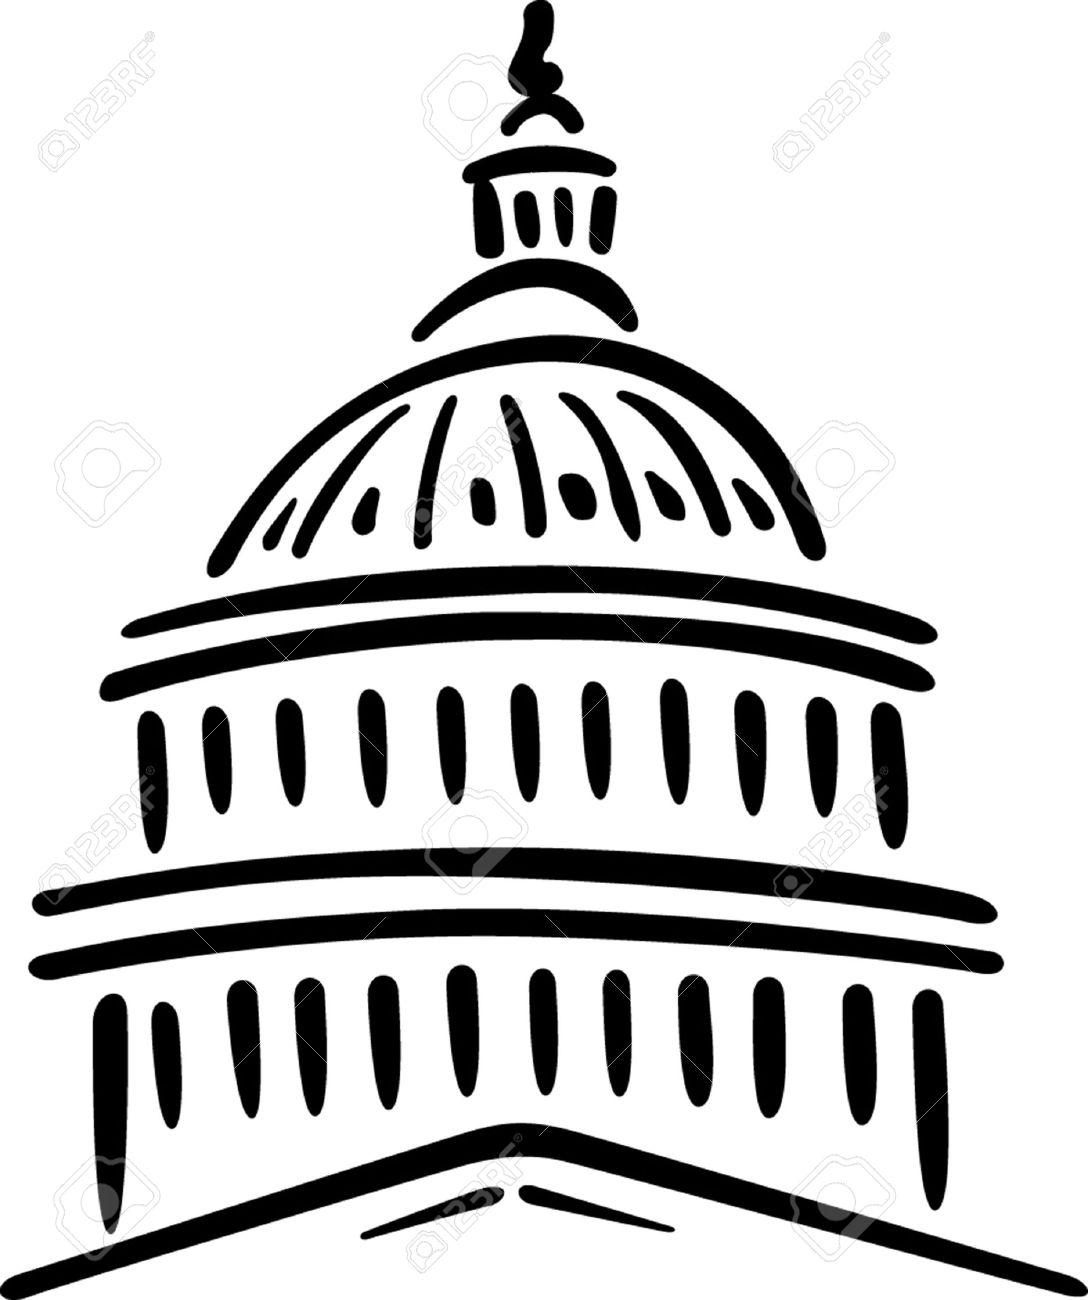 Capitol Building Drawing At Getdrawings